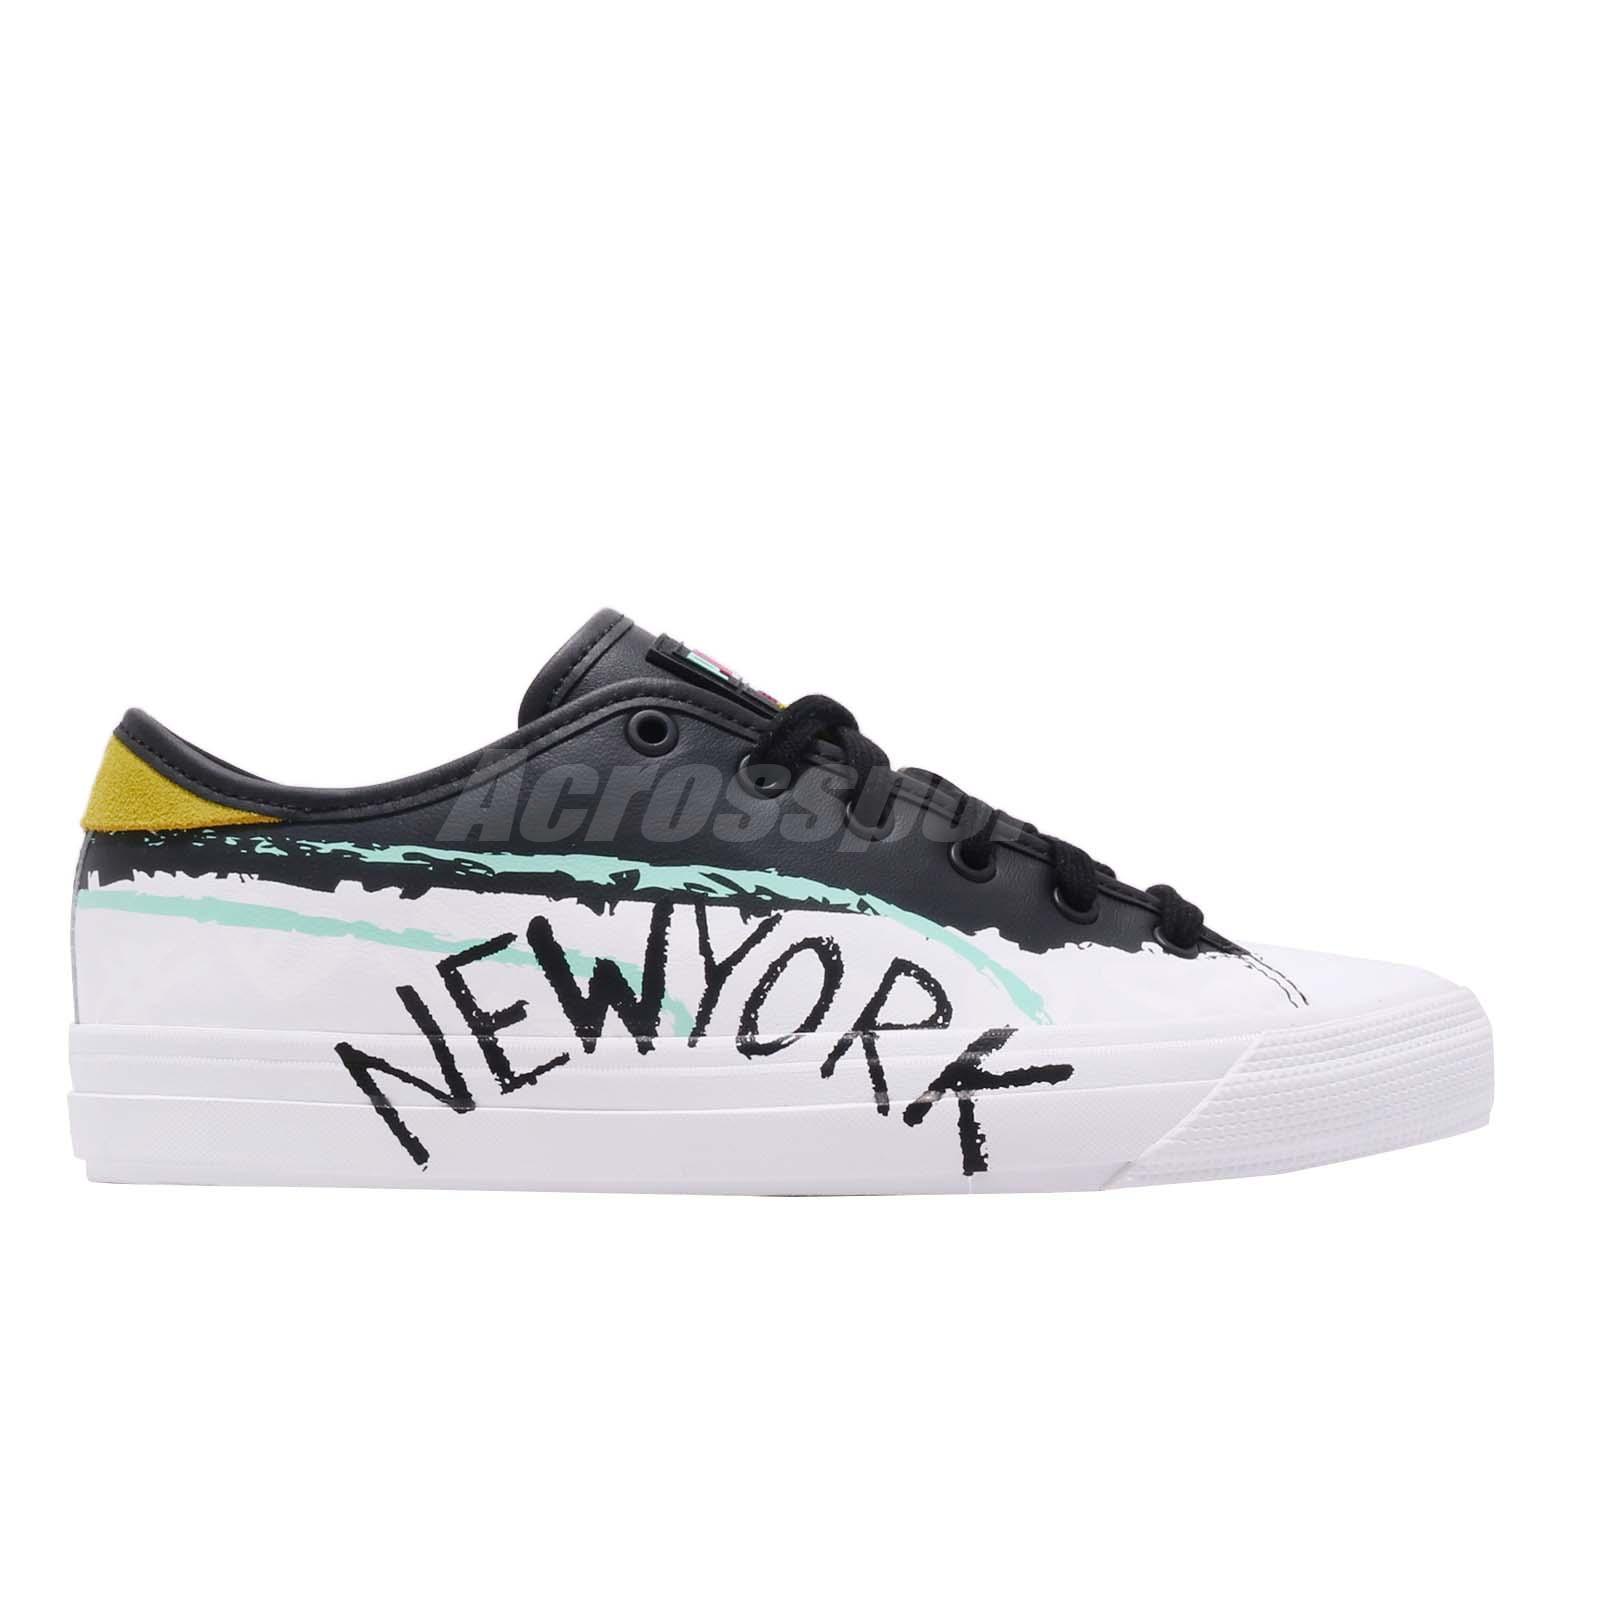 2eacc9380a32 Puma Select Capri x Bradley Theodore New York Men Women Casual Shoes ...